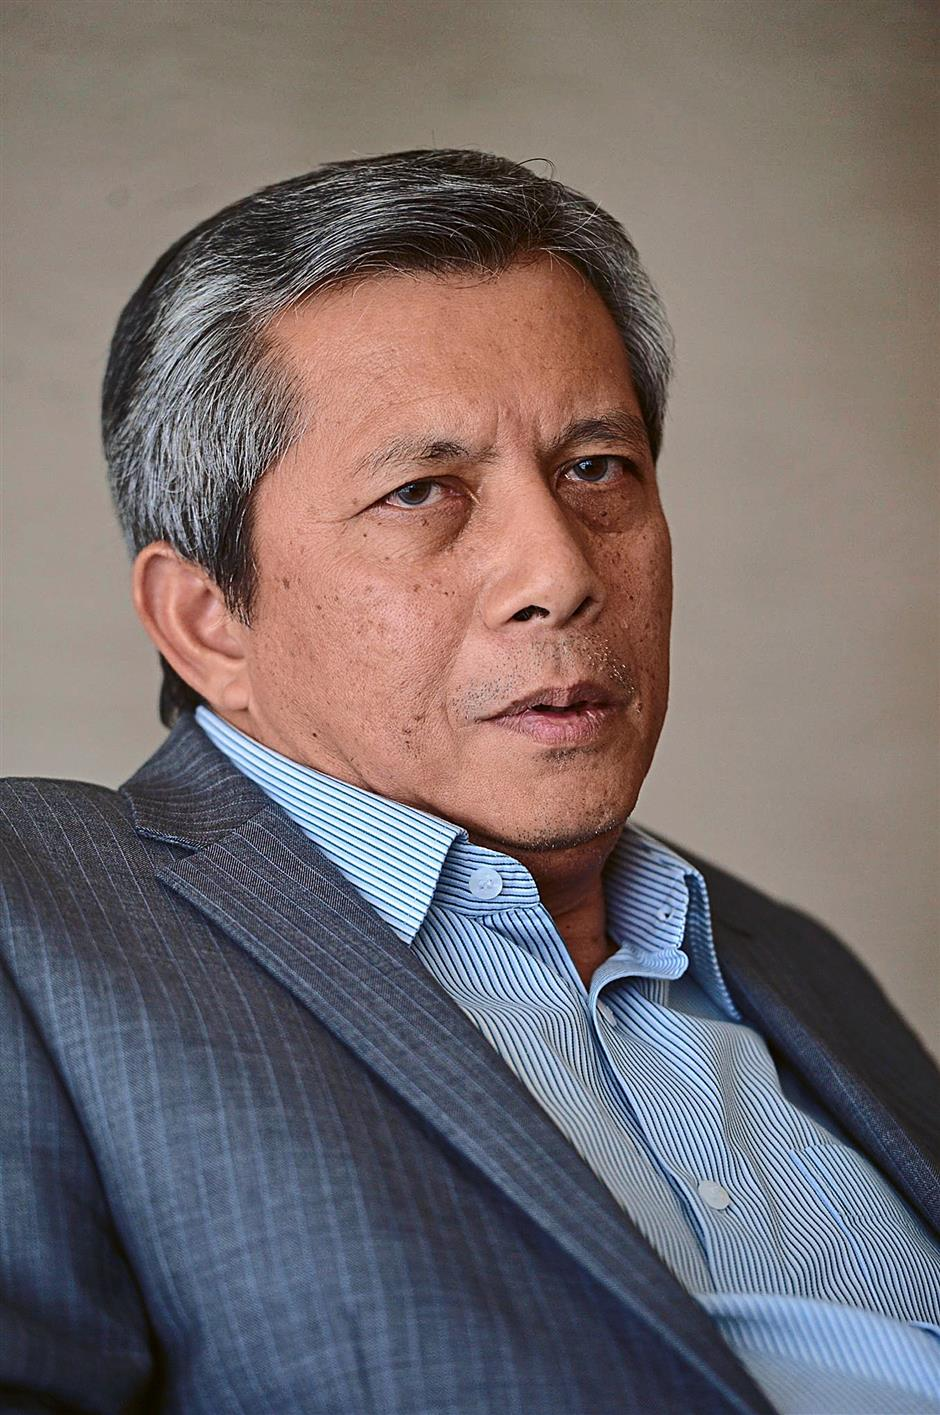 Malaysian Oil and Gas Services Council President and SapuraKencana executive director Ramlan Malek